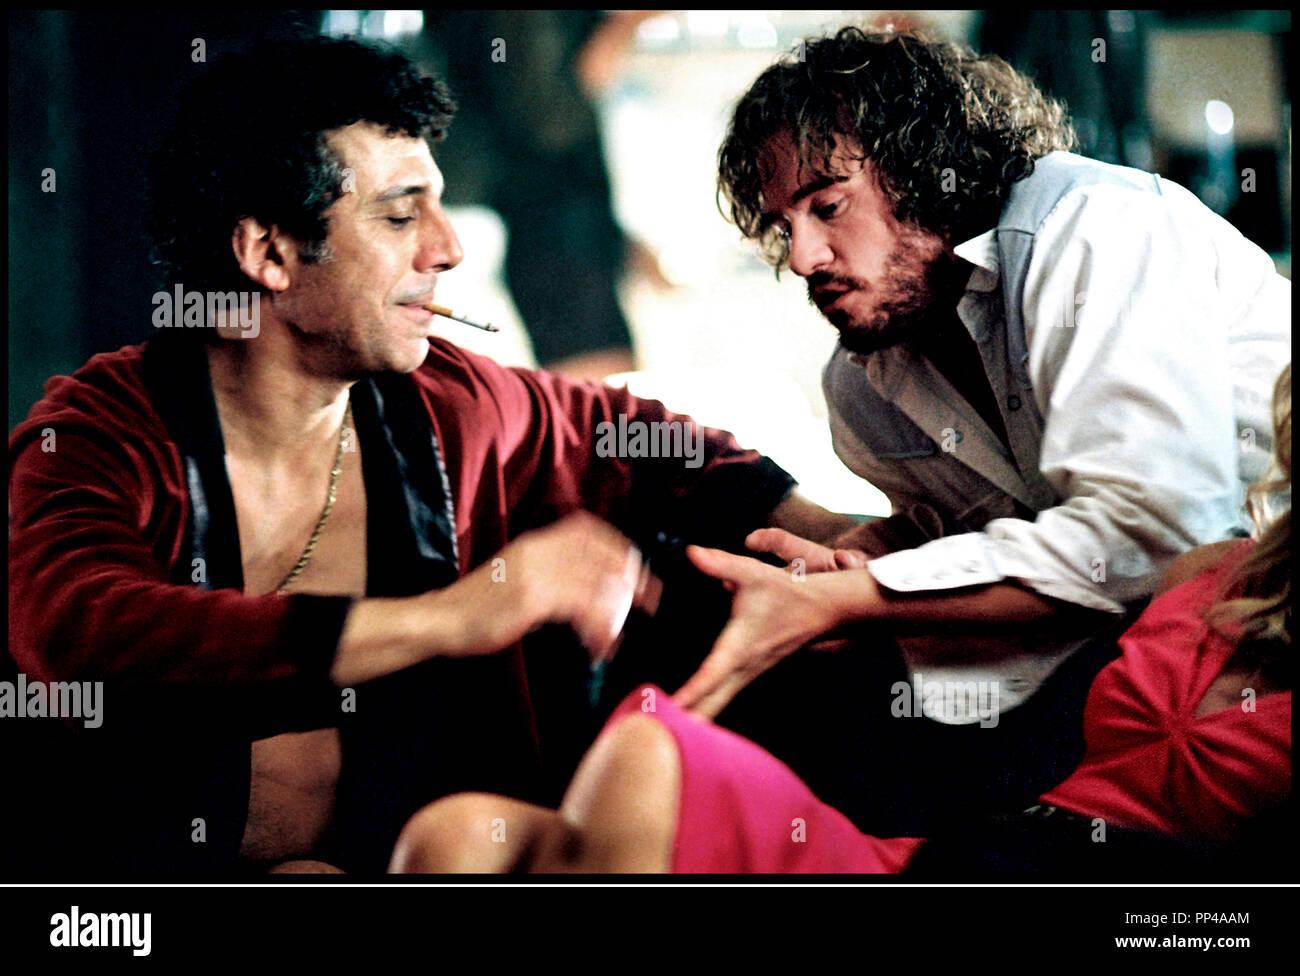 Prod DB © Killer Films - Lions Gate Films / DR WONDERLAND (WONDERLAND) de James Cox 2003 USA / CAN avec Eric Bogosian et Val Kilmer fumer, voler Photo Stock